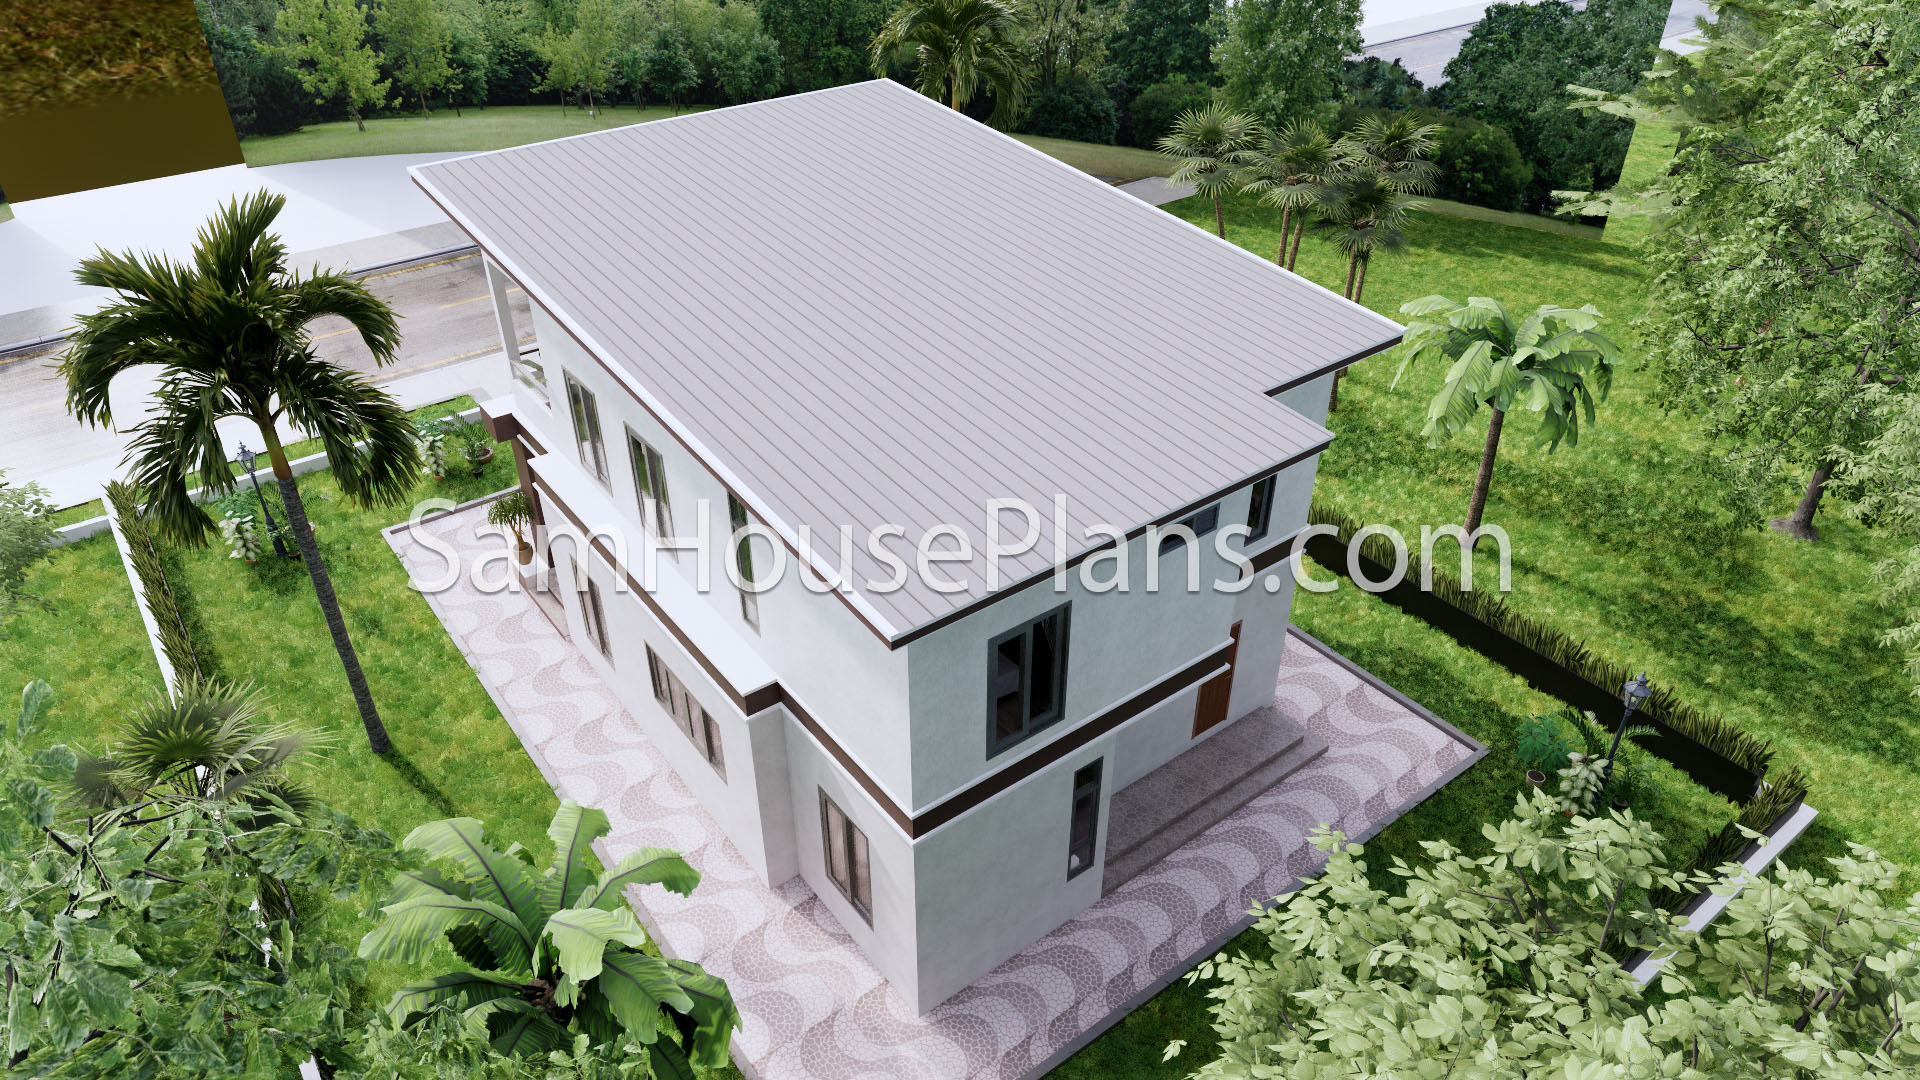 27x40 House Plans 8x10 Meters 4 Bedrooms 6